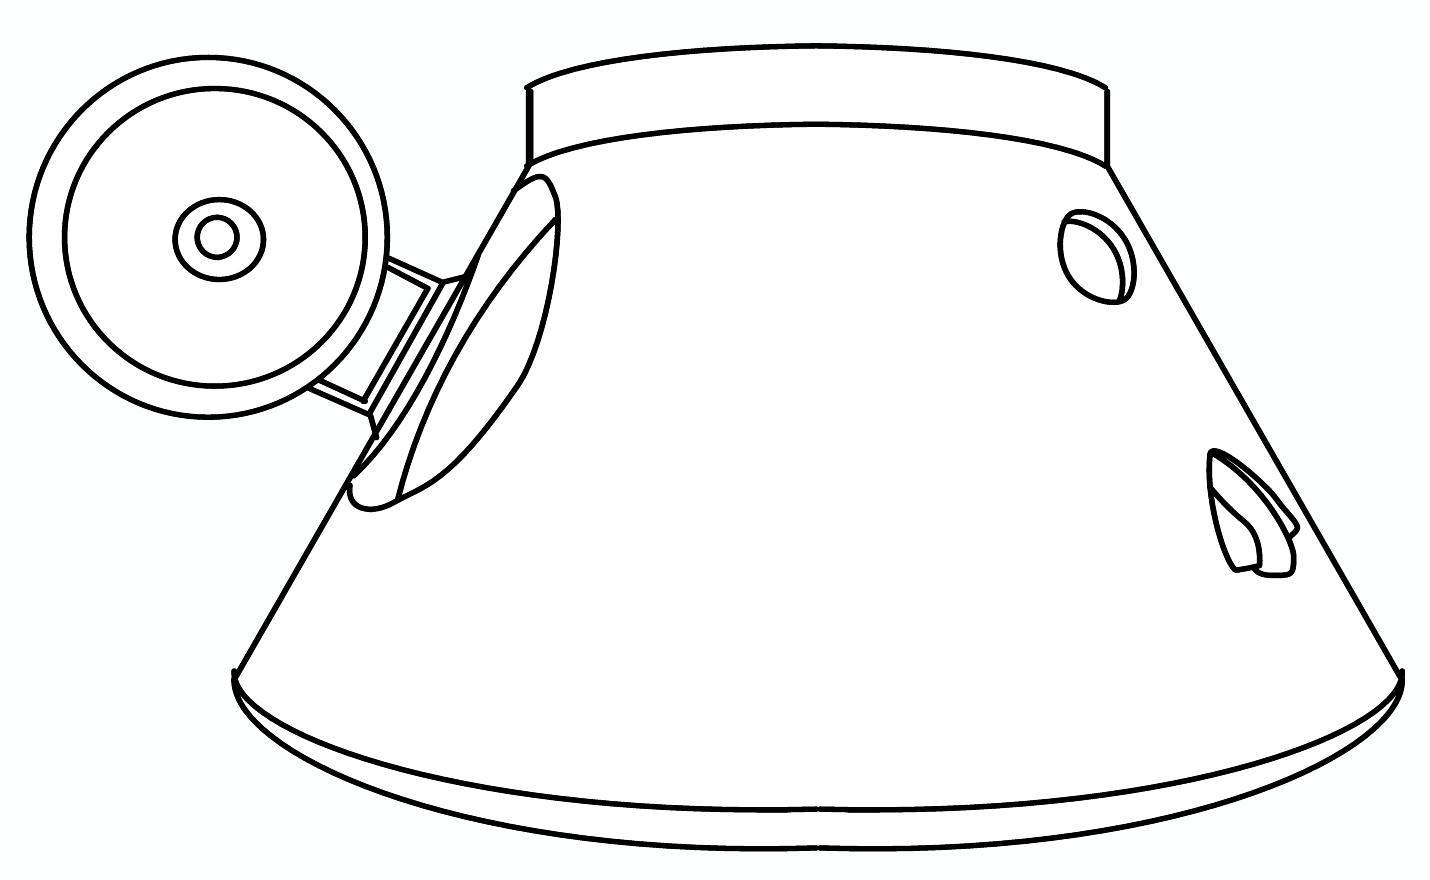 File:TKS landing capsule drawing.png.